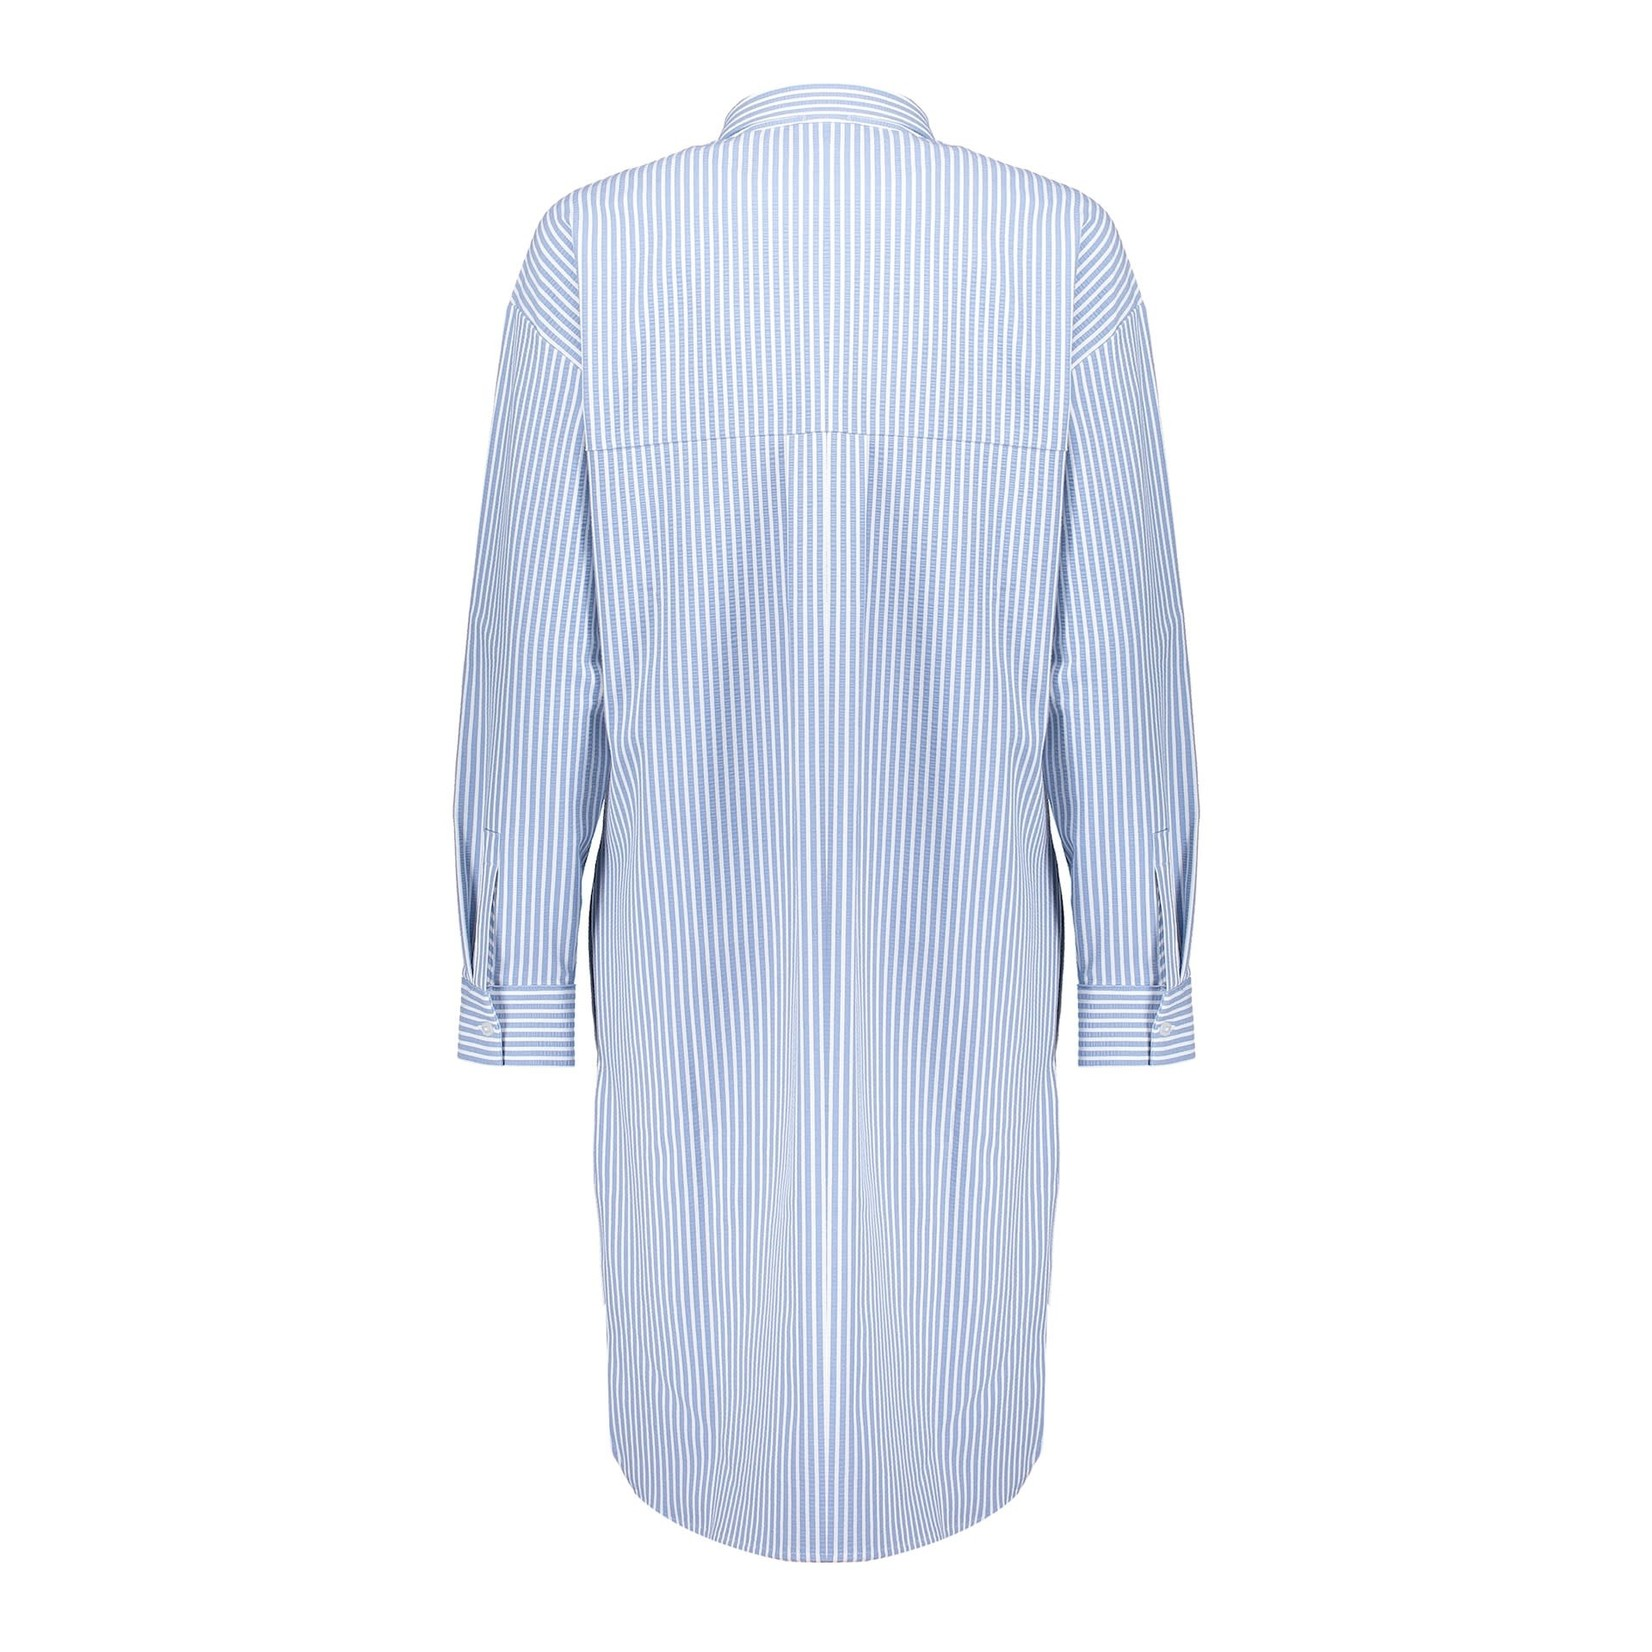 Geisha Geisha dress blue striped  17133-20